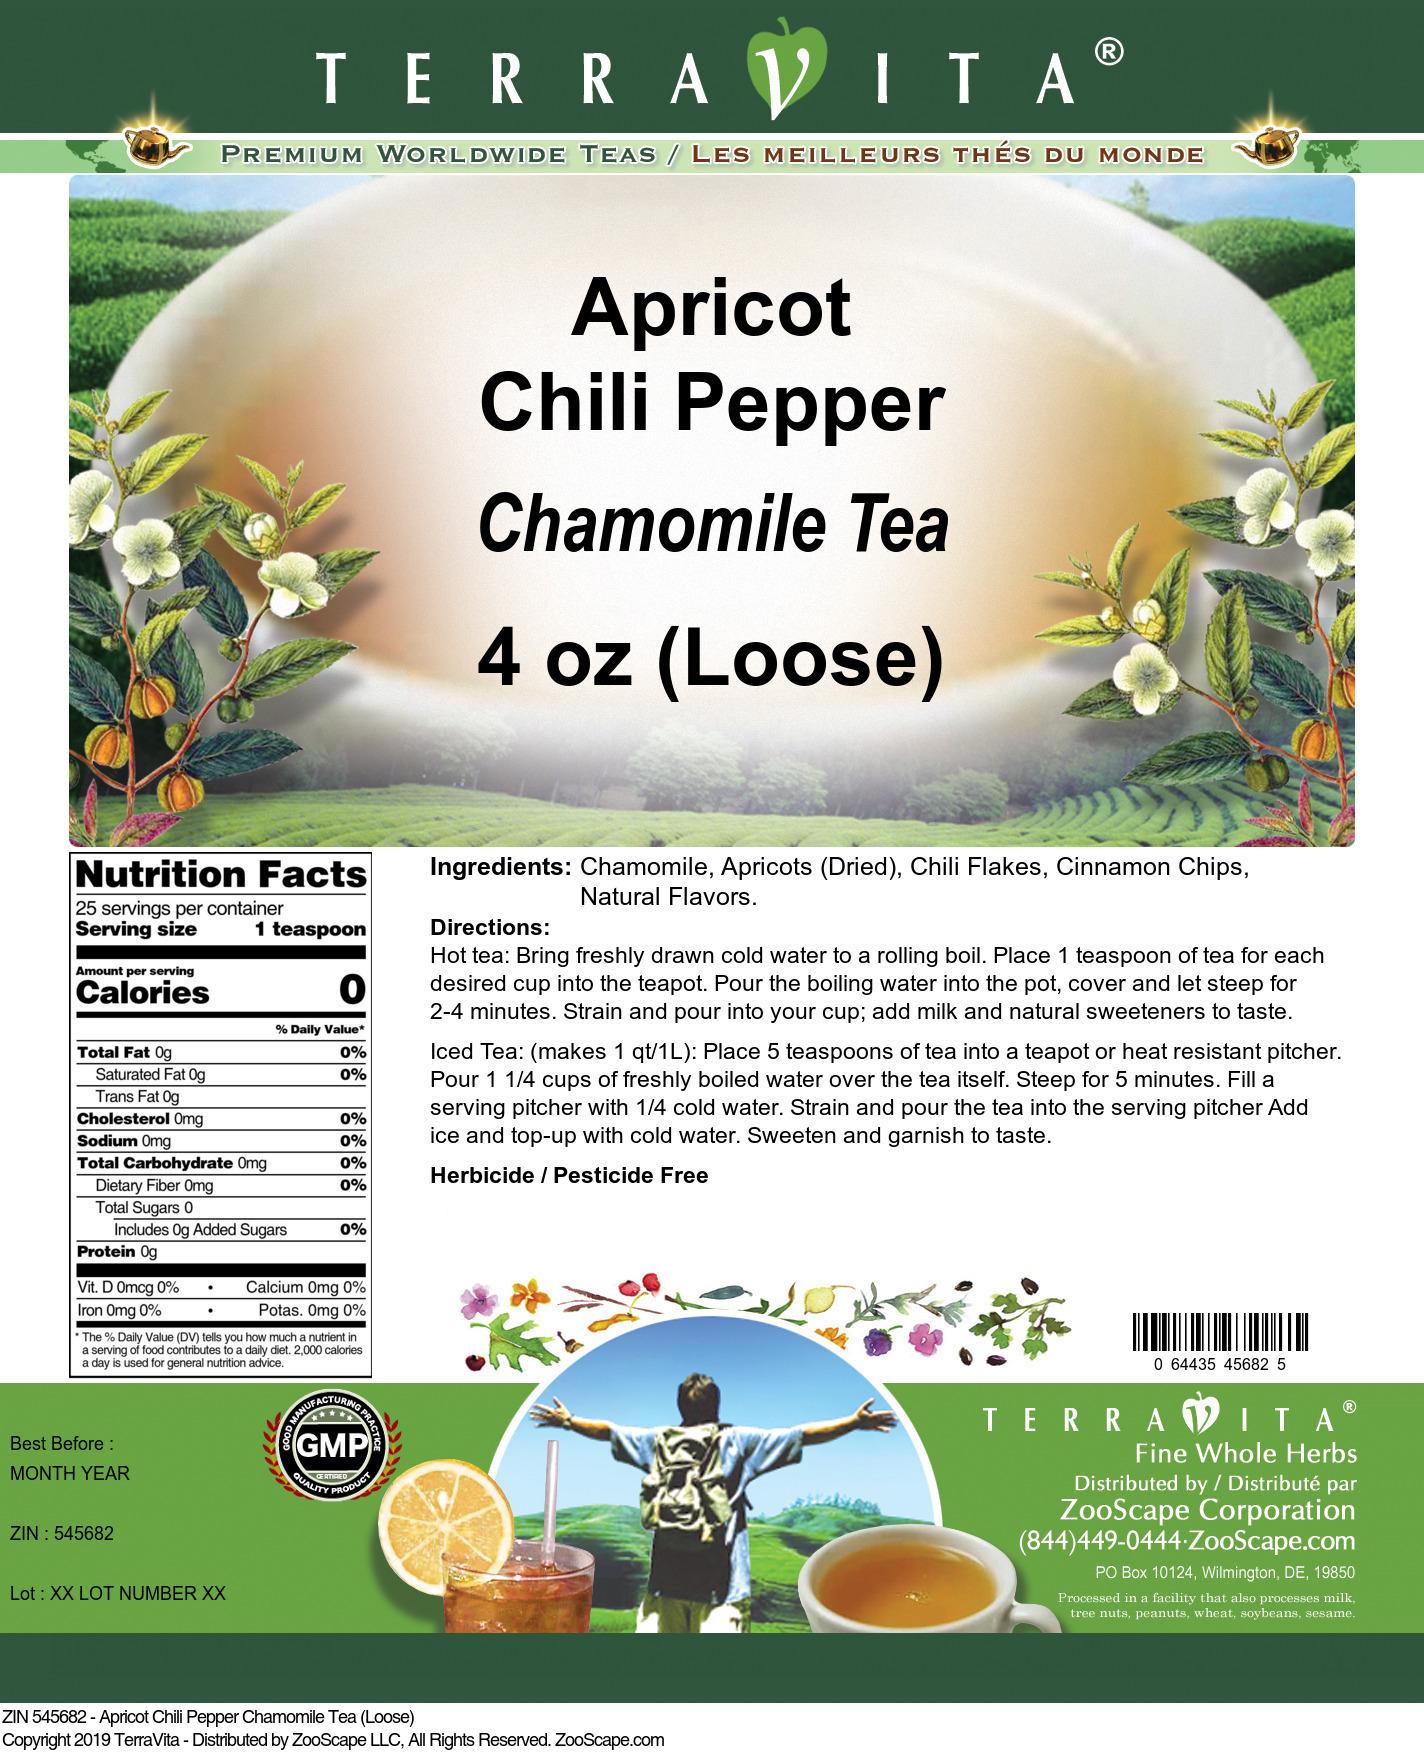 Apricot Chili Pepper Chamomile Tea (Loose)